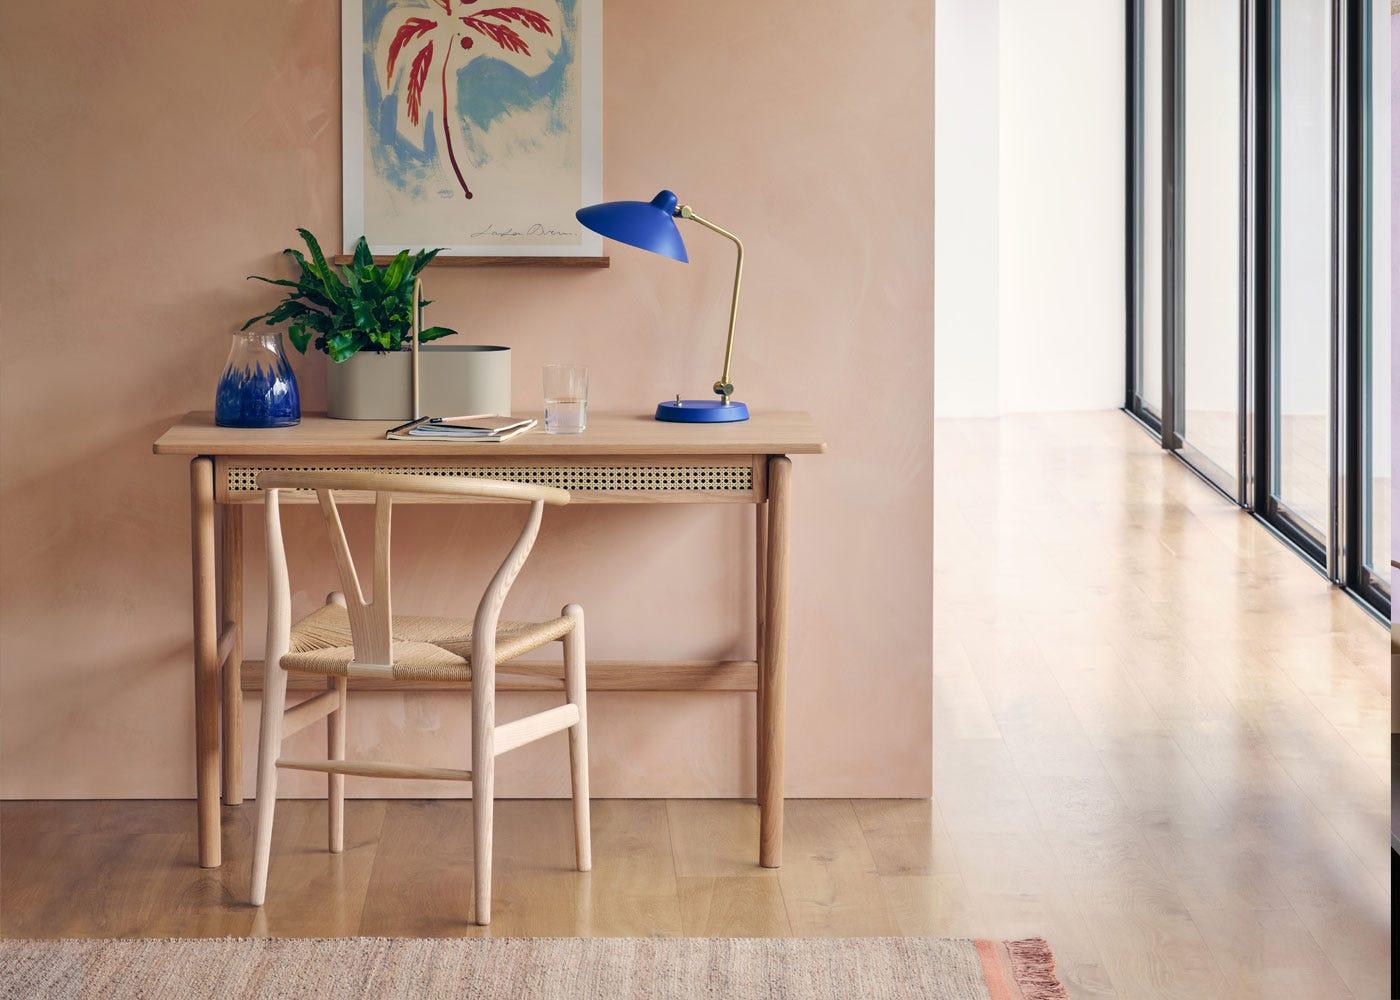 Milton blue table lamp, Flette desk with CH24 wishbone chair.